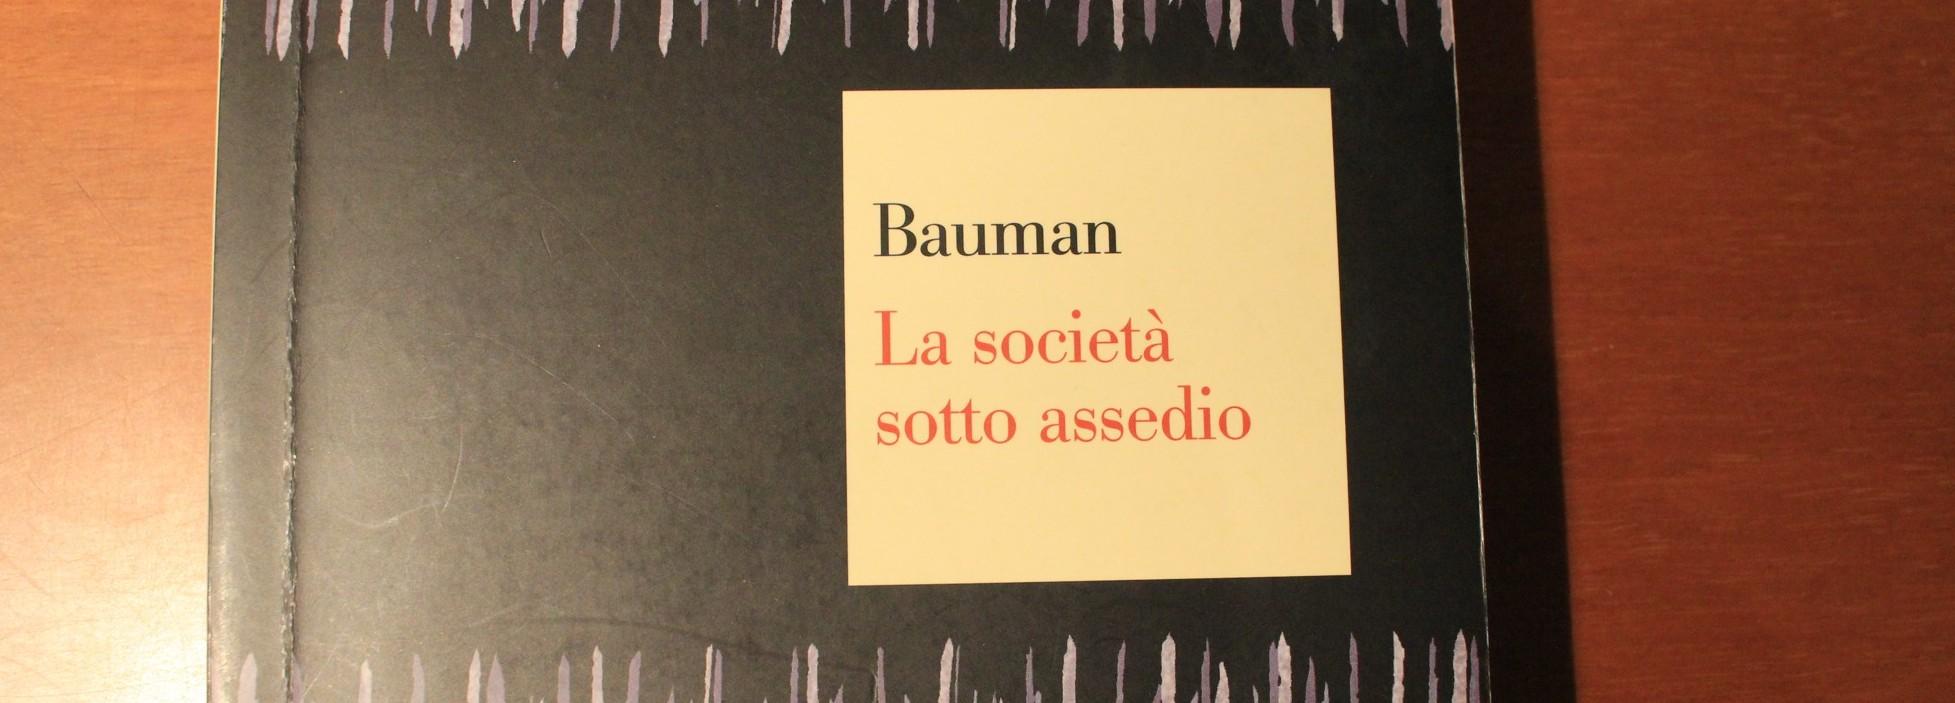 società-sotto-assedio-bauman